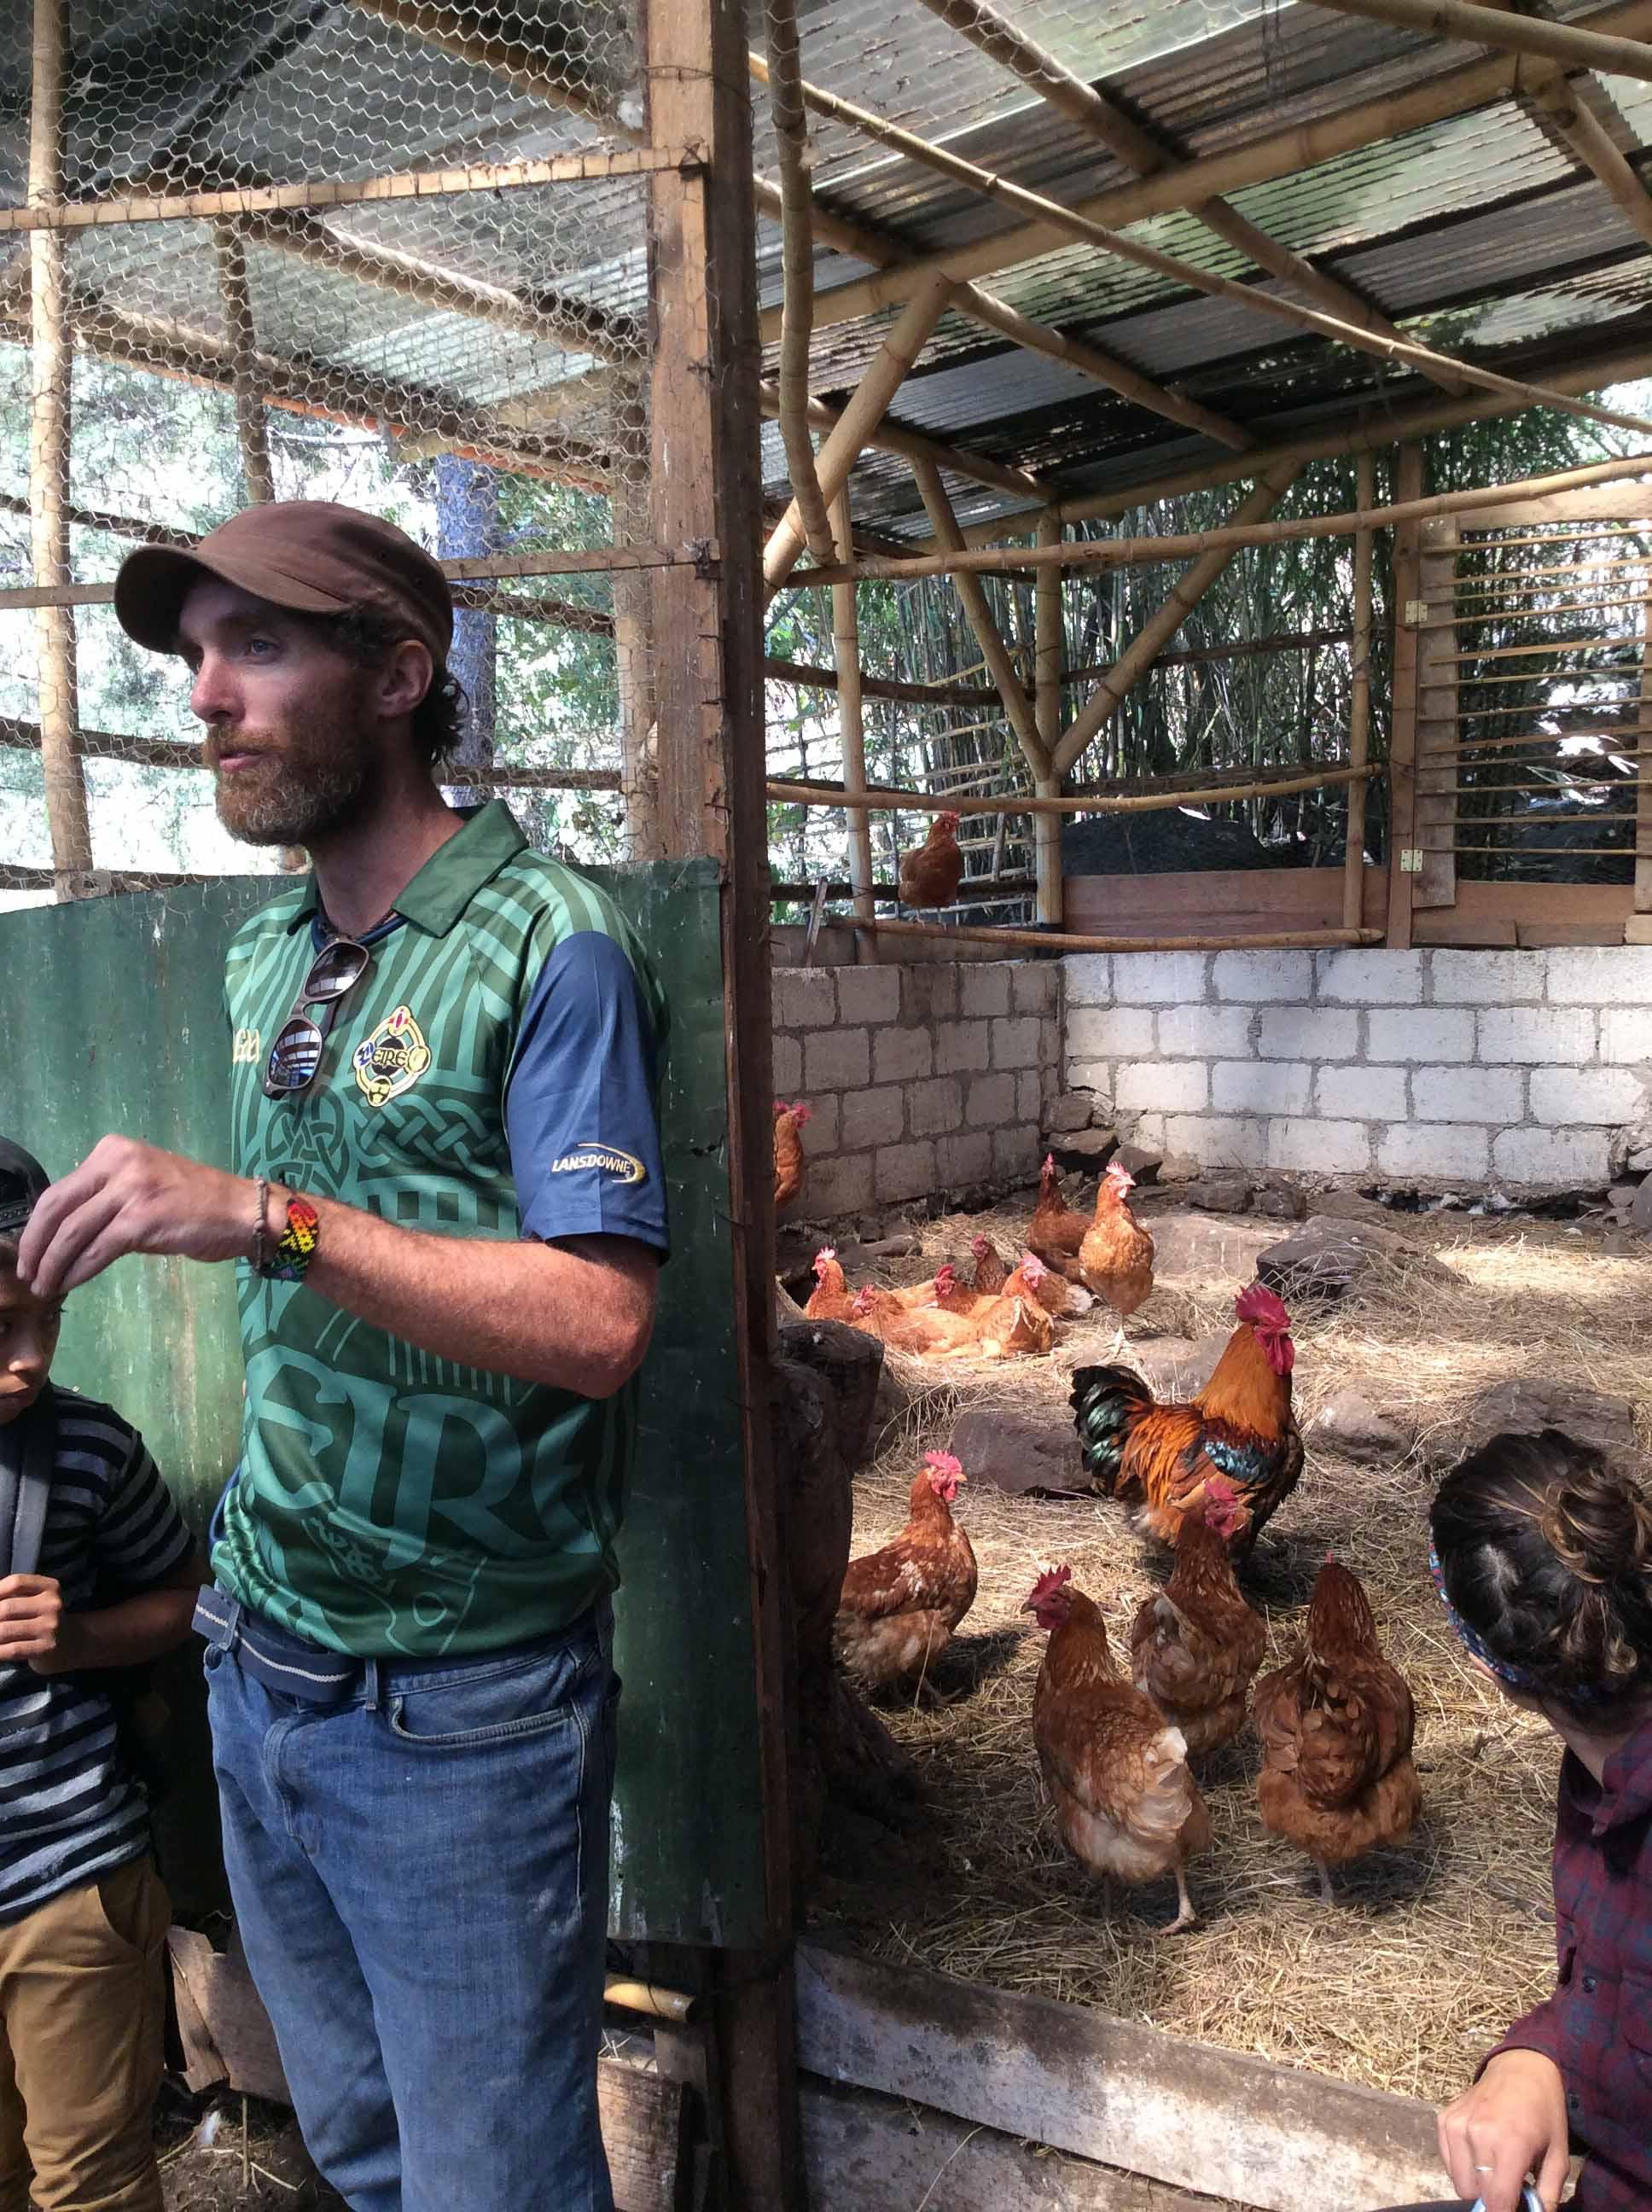 Neal Hegarty, Atitlan Organics, Abundant Edge, blog, Permaculture Course, regenerative agriculture, permaculture, Tzununa, Lake Atitlan, Guatemala, Central America